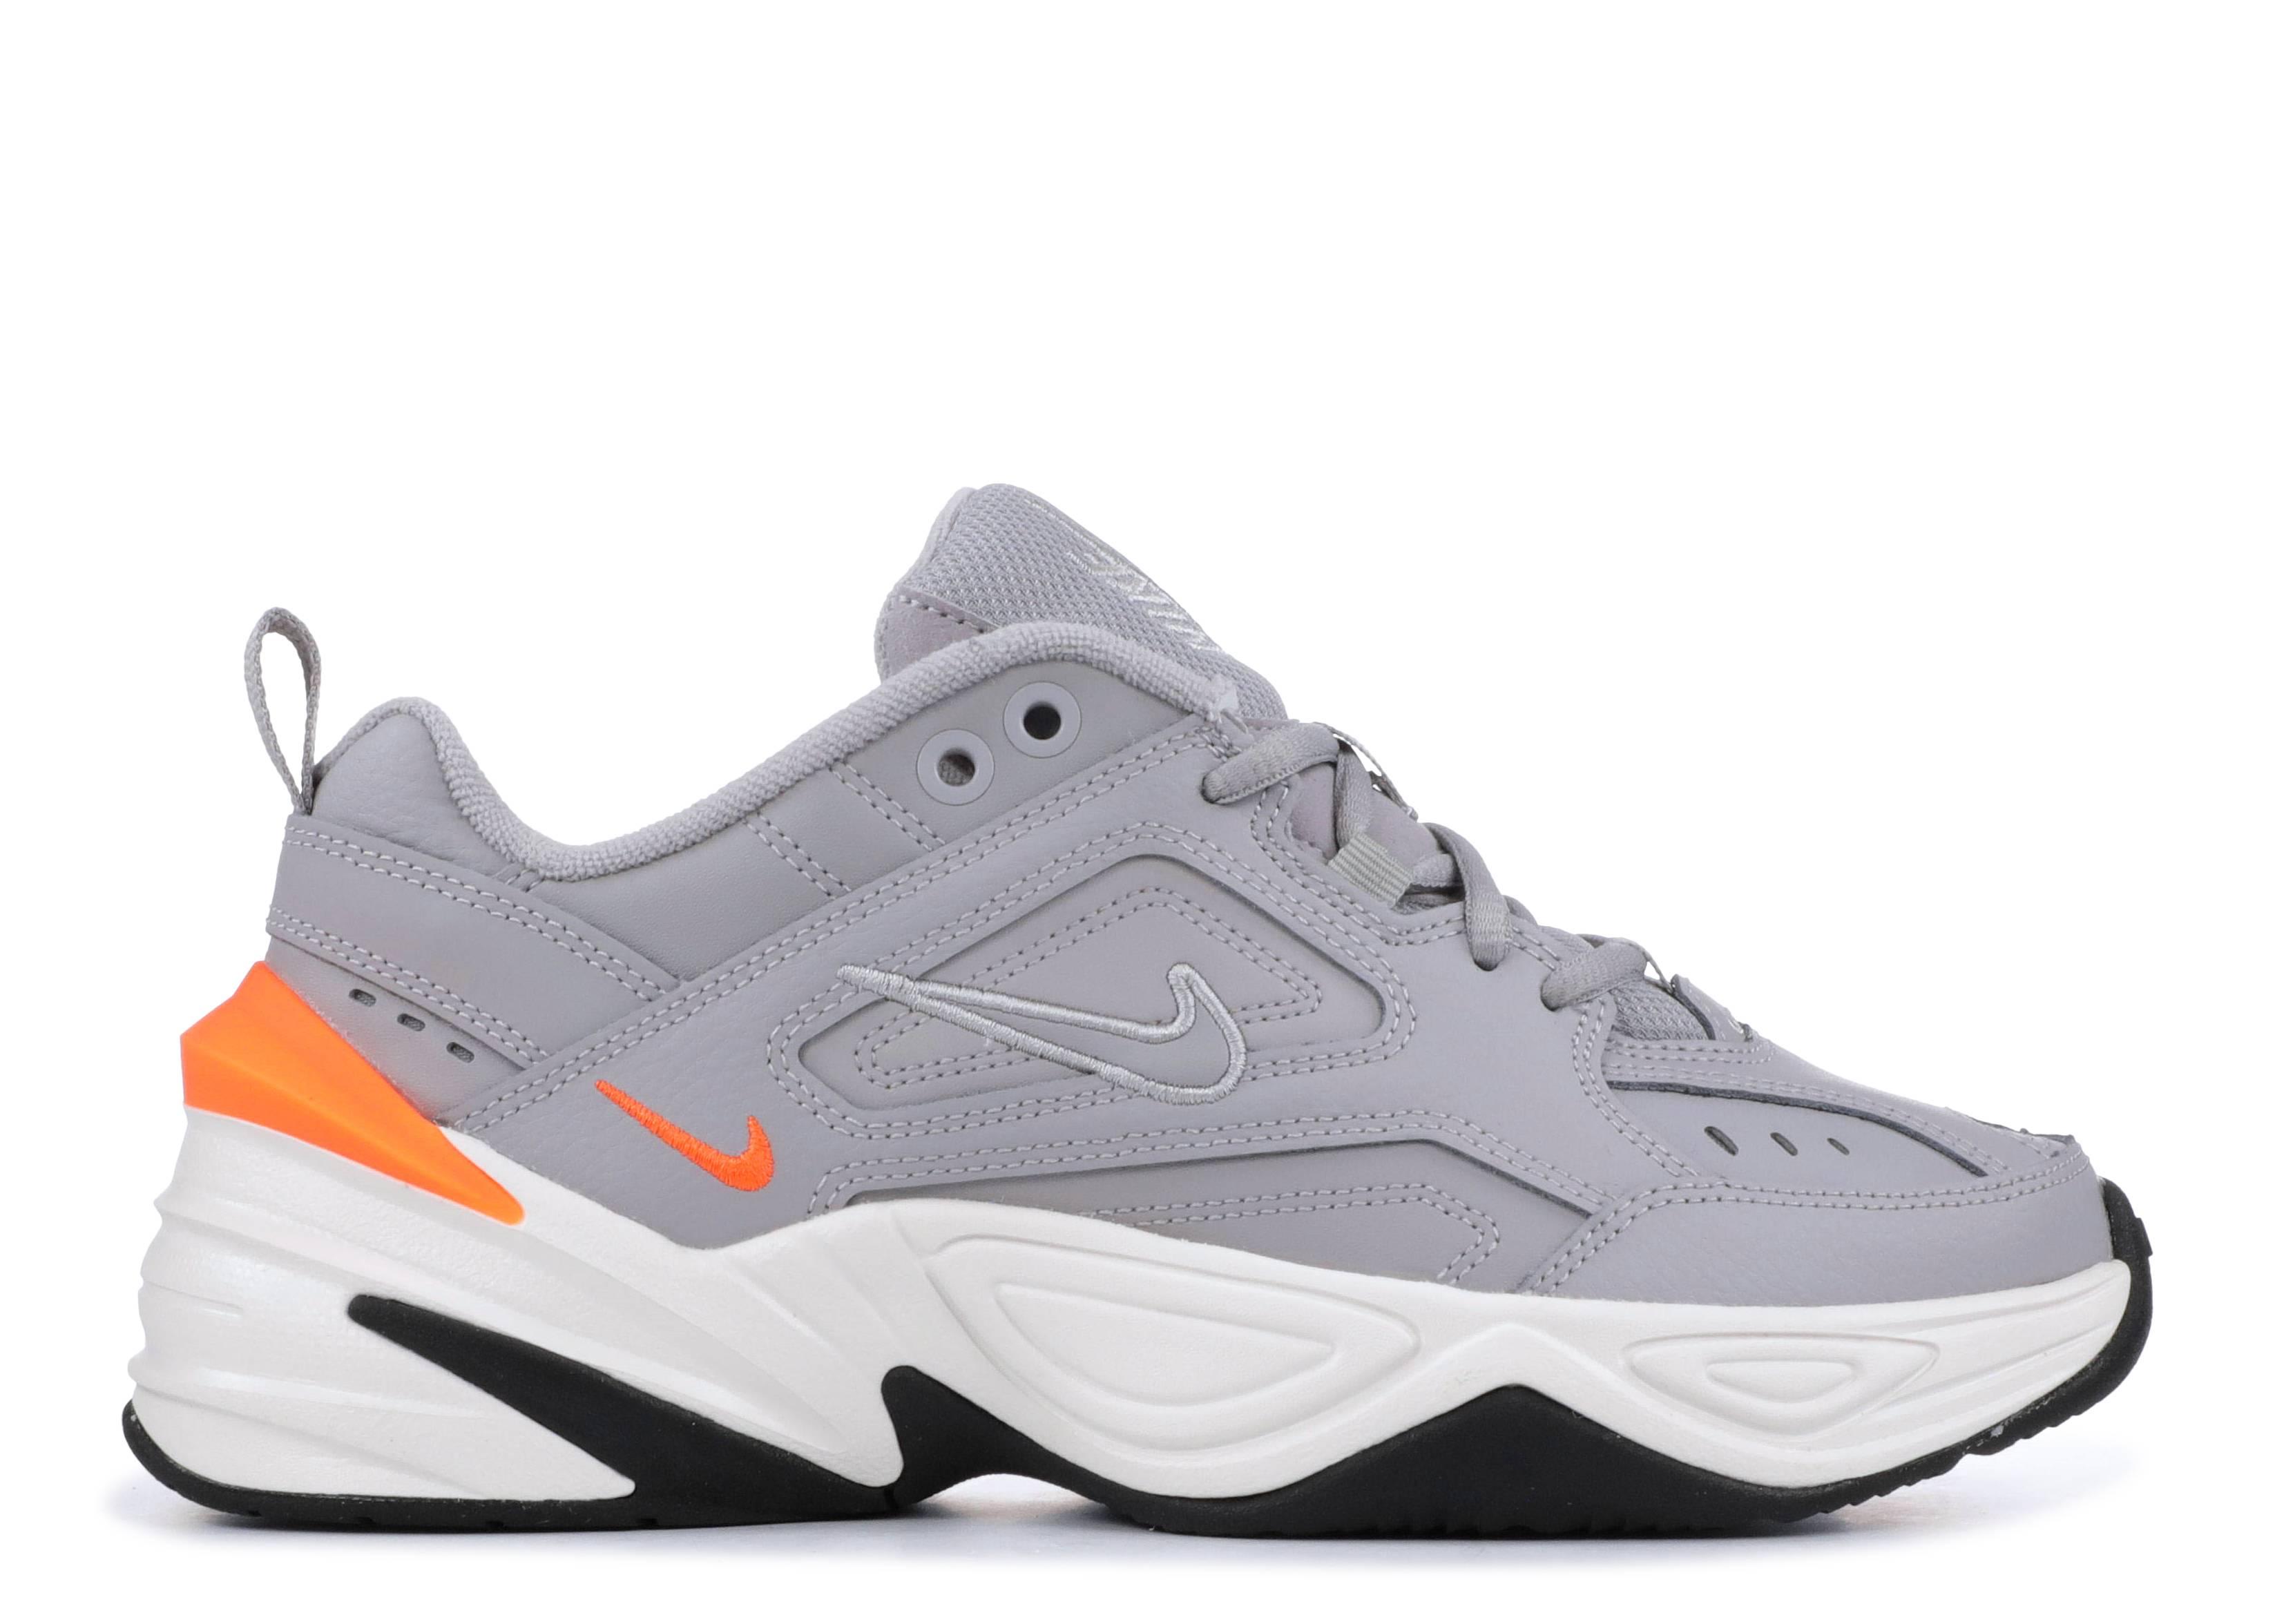 buy online 58ea2 cd9f1 Wmns M2k Tekno - Nike - ao3108 004 - atmosphere grey phantom total ...